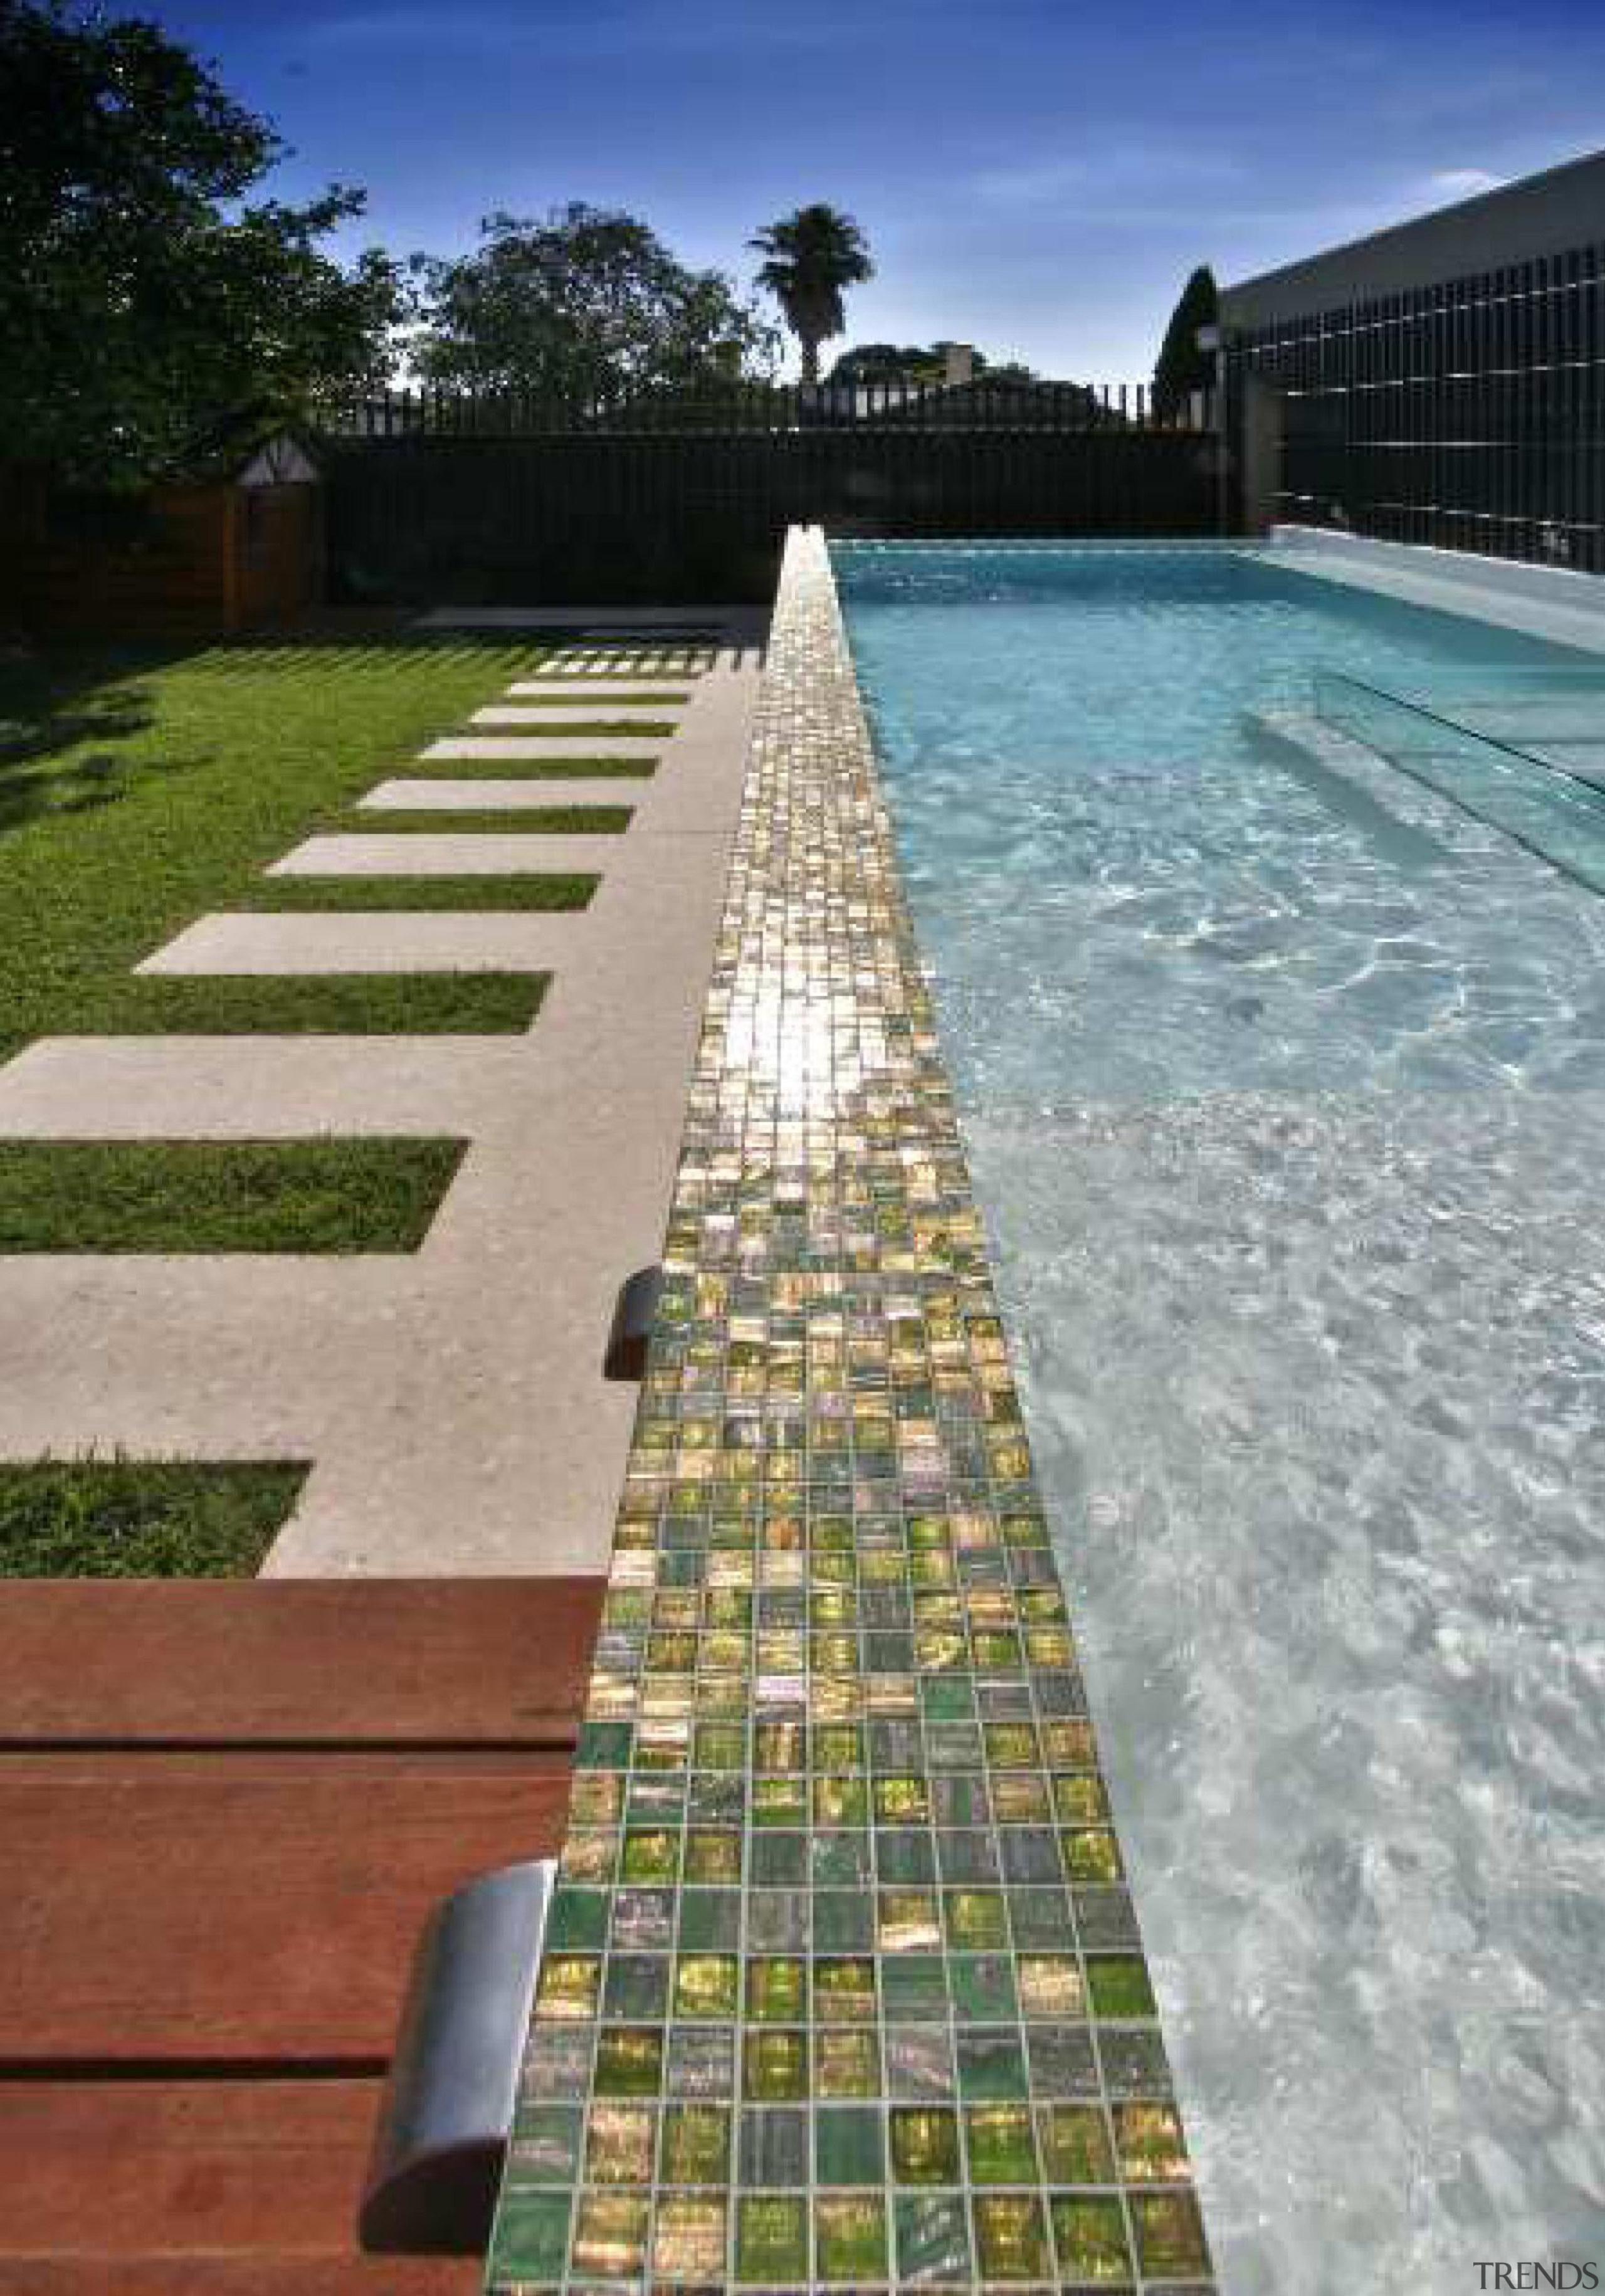 Bisazza swimming pools australia-le gemme - Bisazza Range reflecting pool, swimming pool, walkway, water, gray